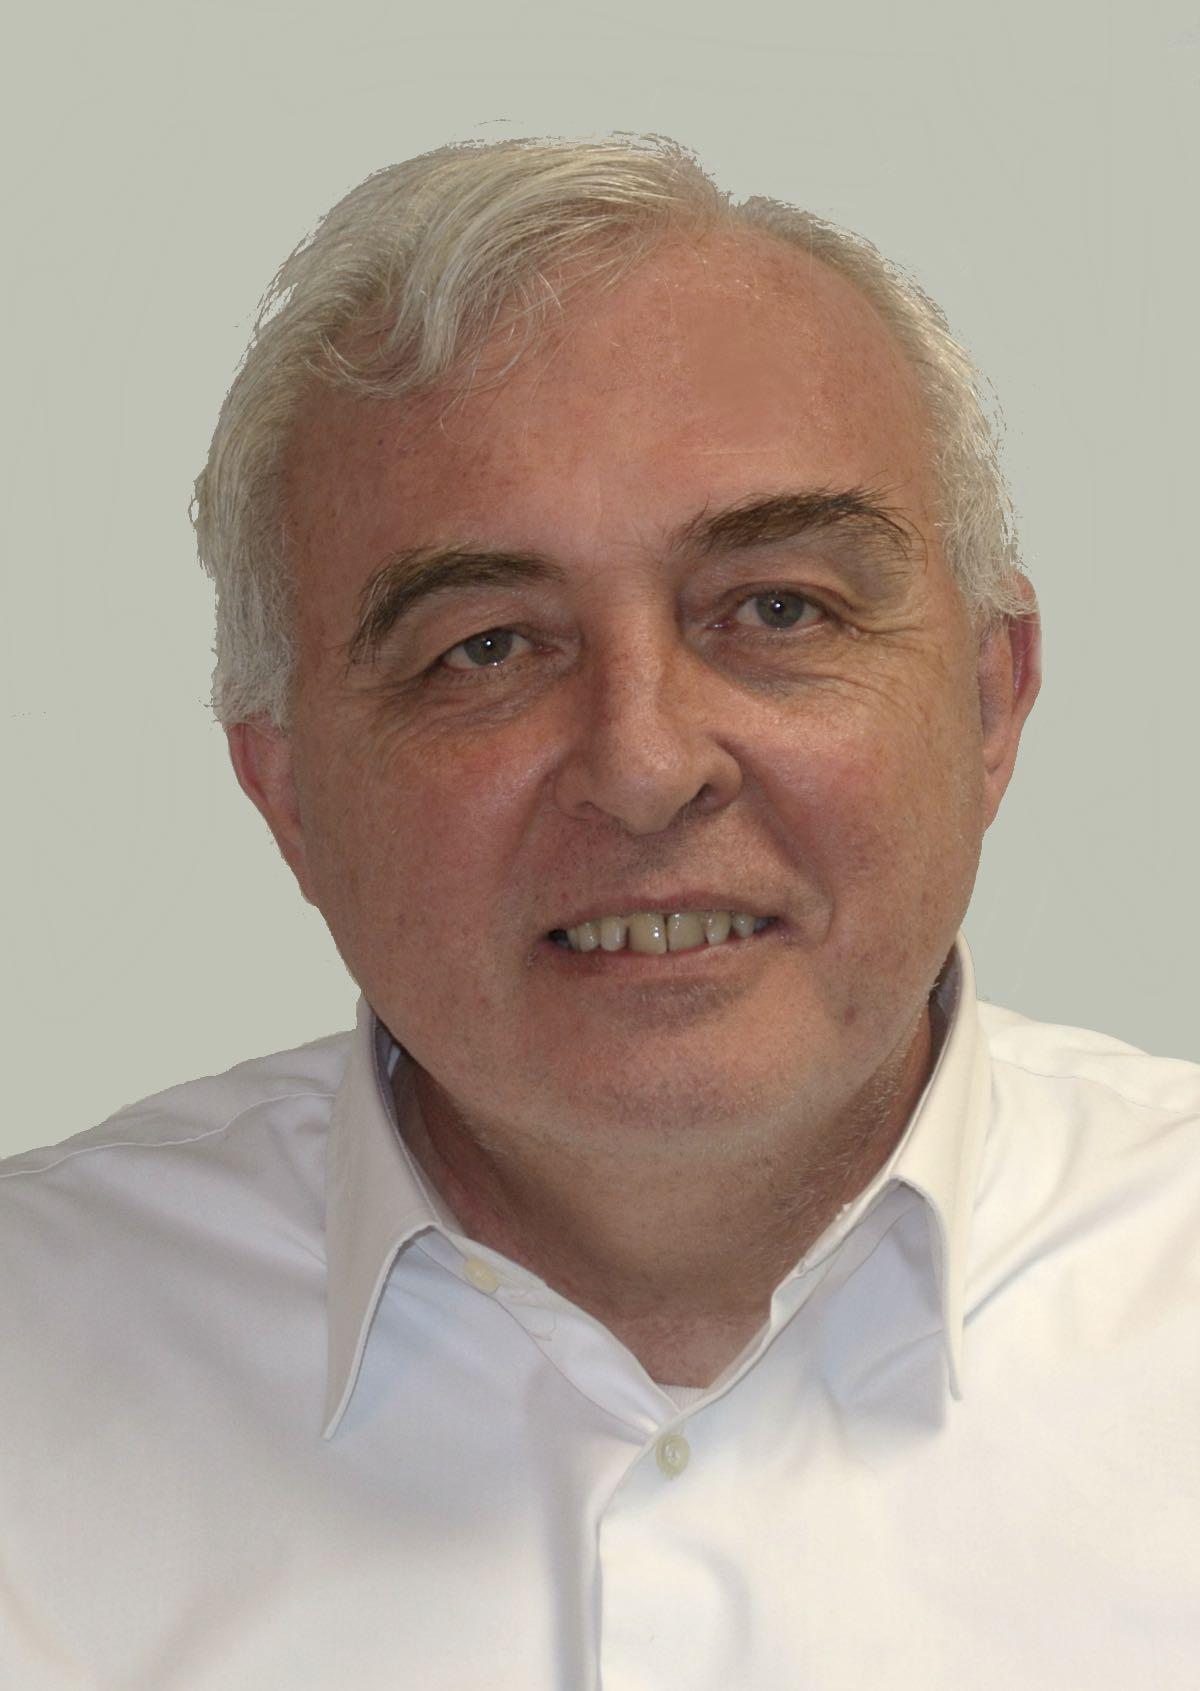 photo of Javier Uceda